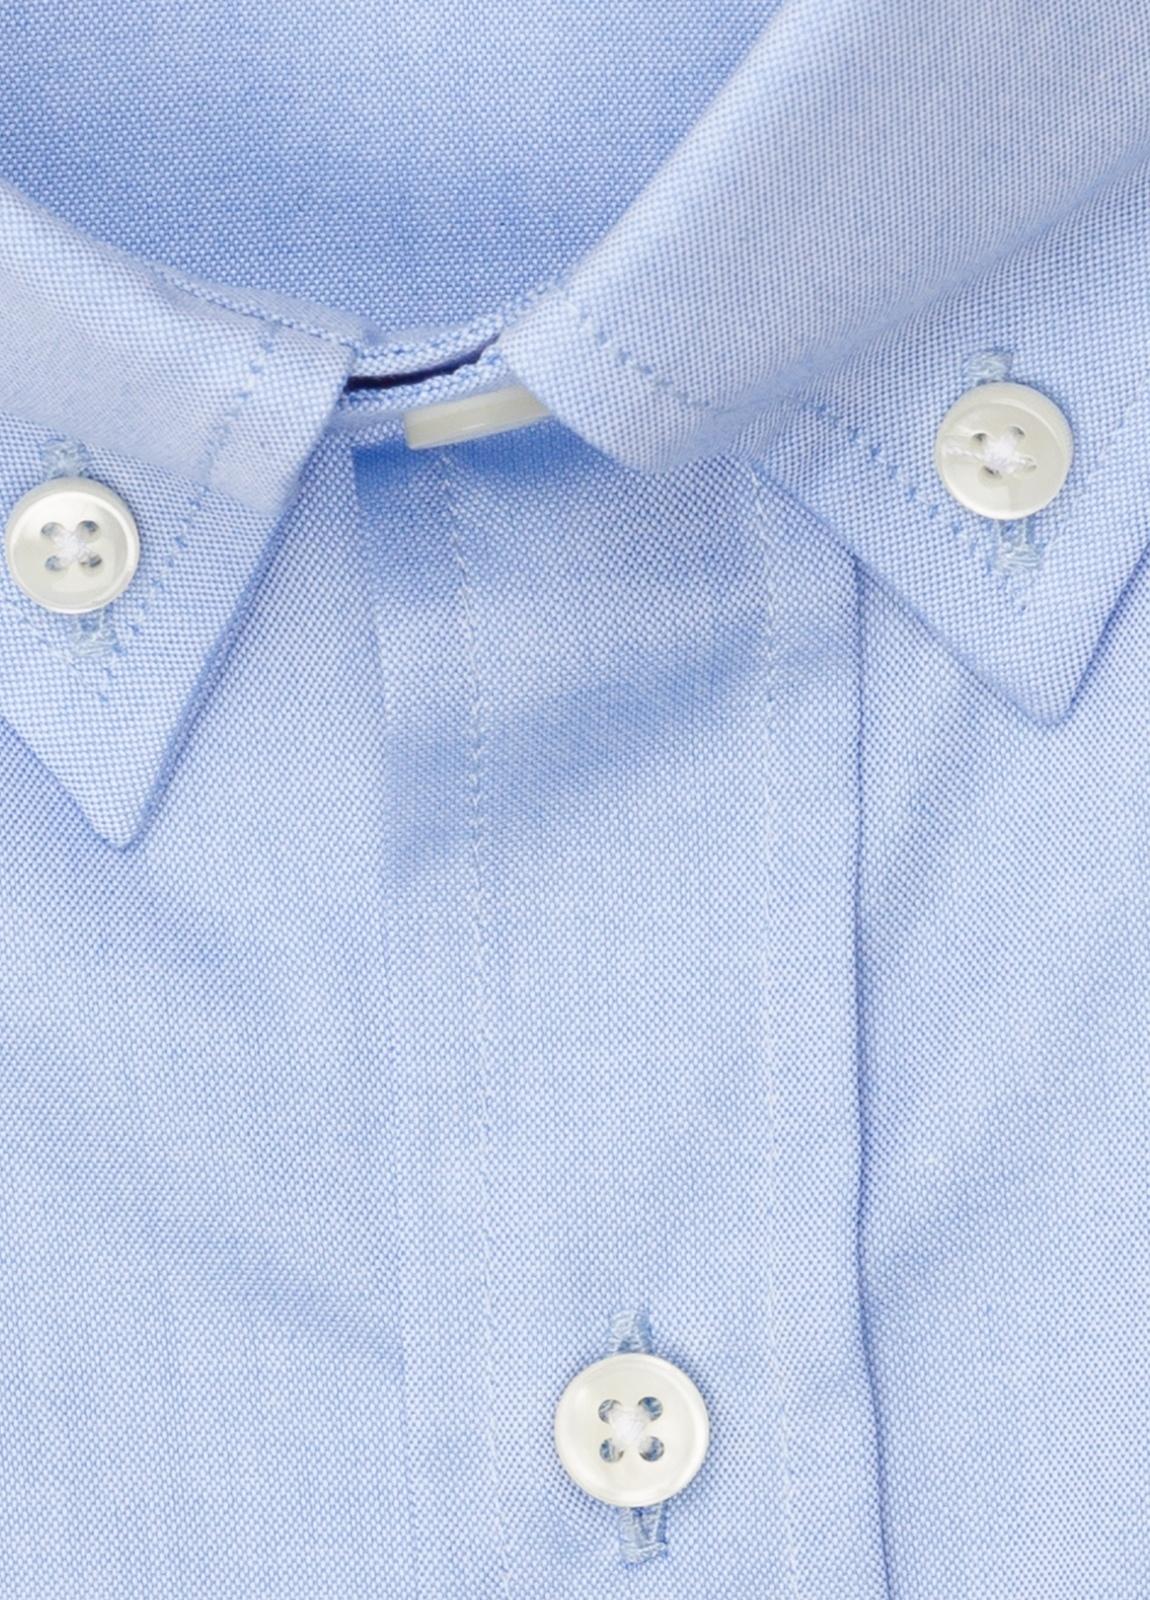 Camisa vestir FUREST COLECCIÓN REGULAR FIT cuello botón pin point celeste - Ítem1